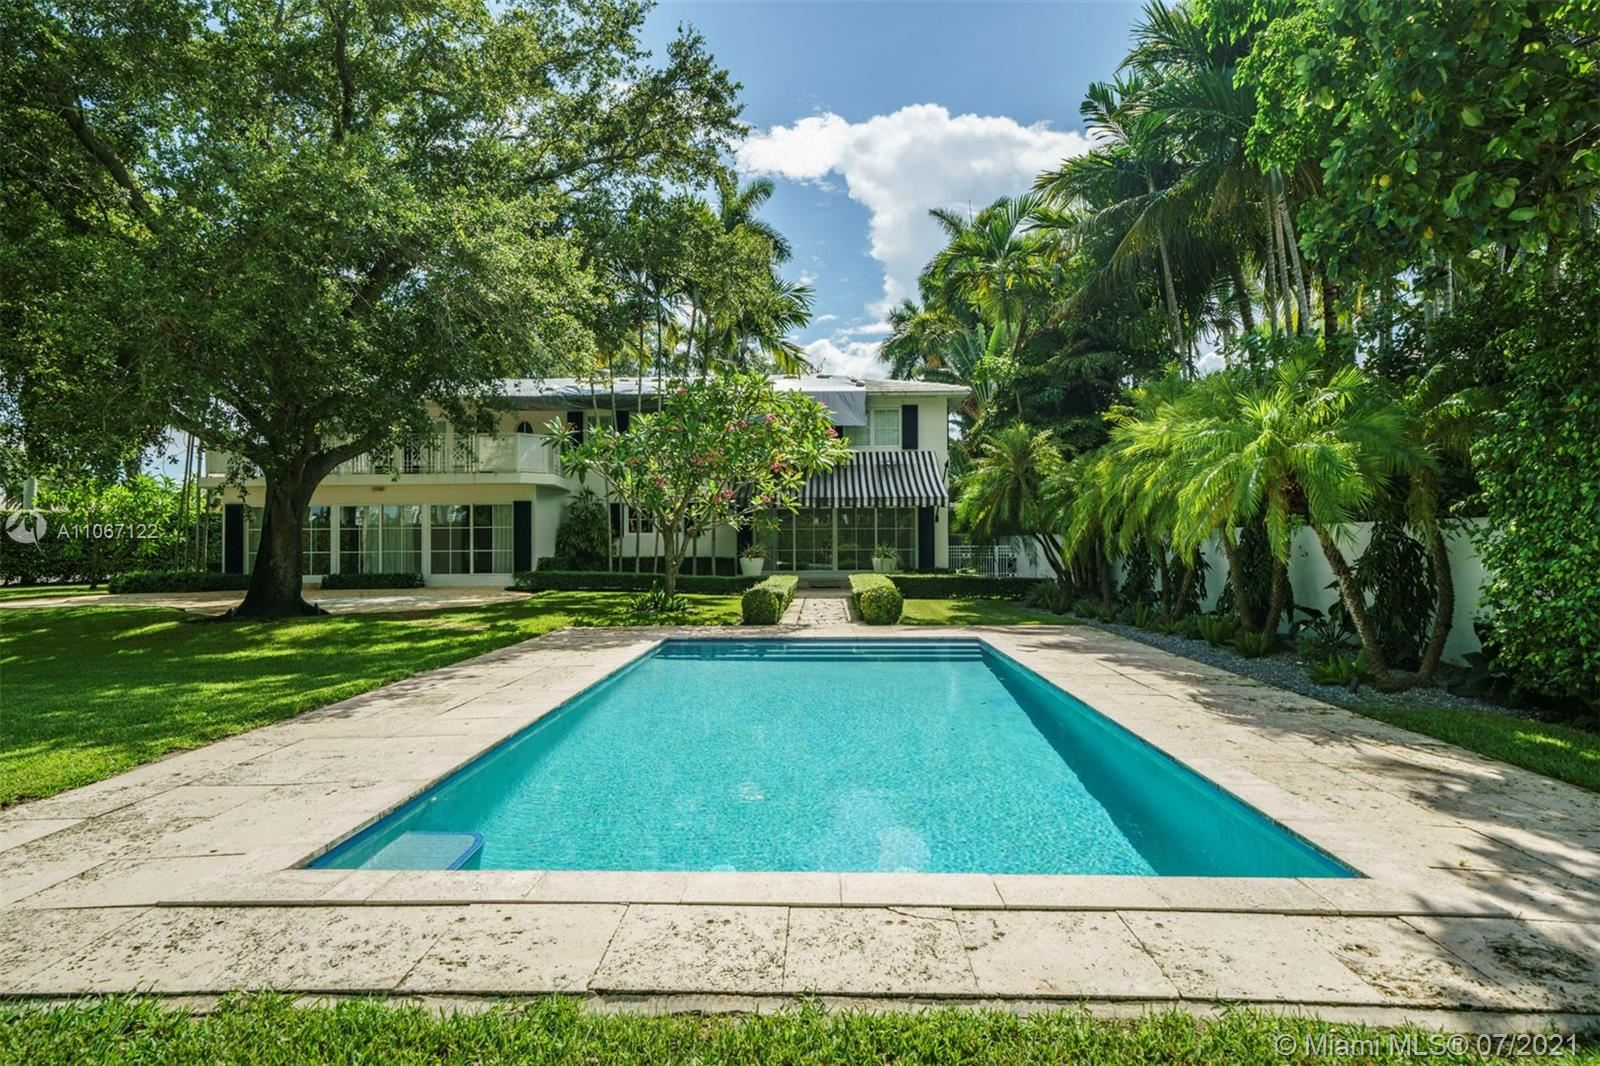 6605 Pinetree Ln, Miami Beach, FL 33141 - #: A11067122